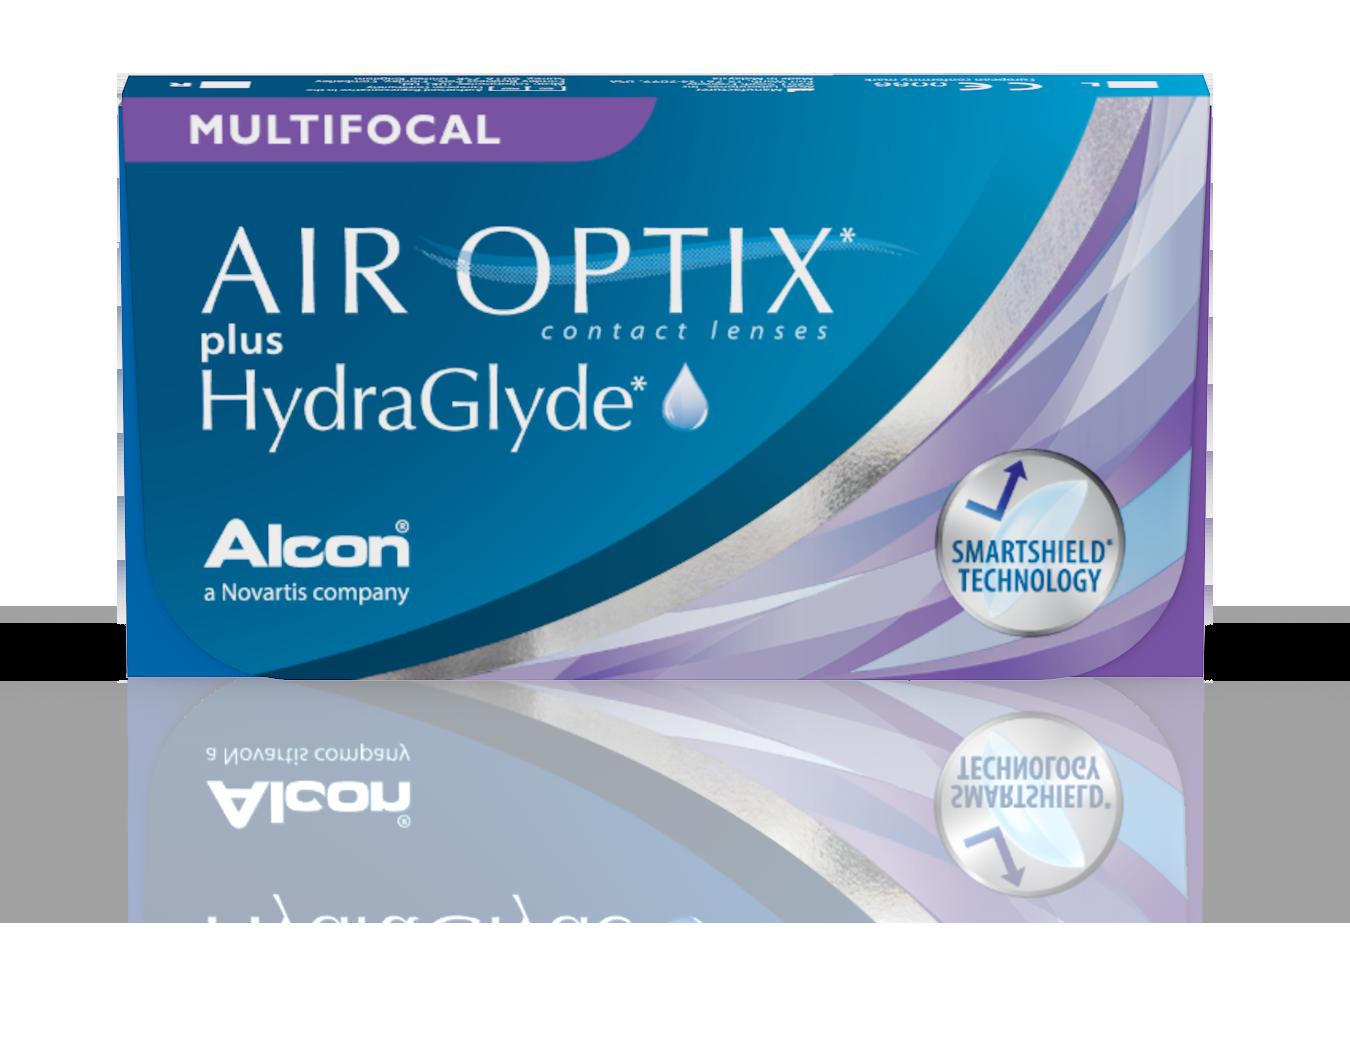 AIR OPTIX® Multifocal plus HydraGlyde®